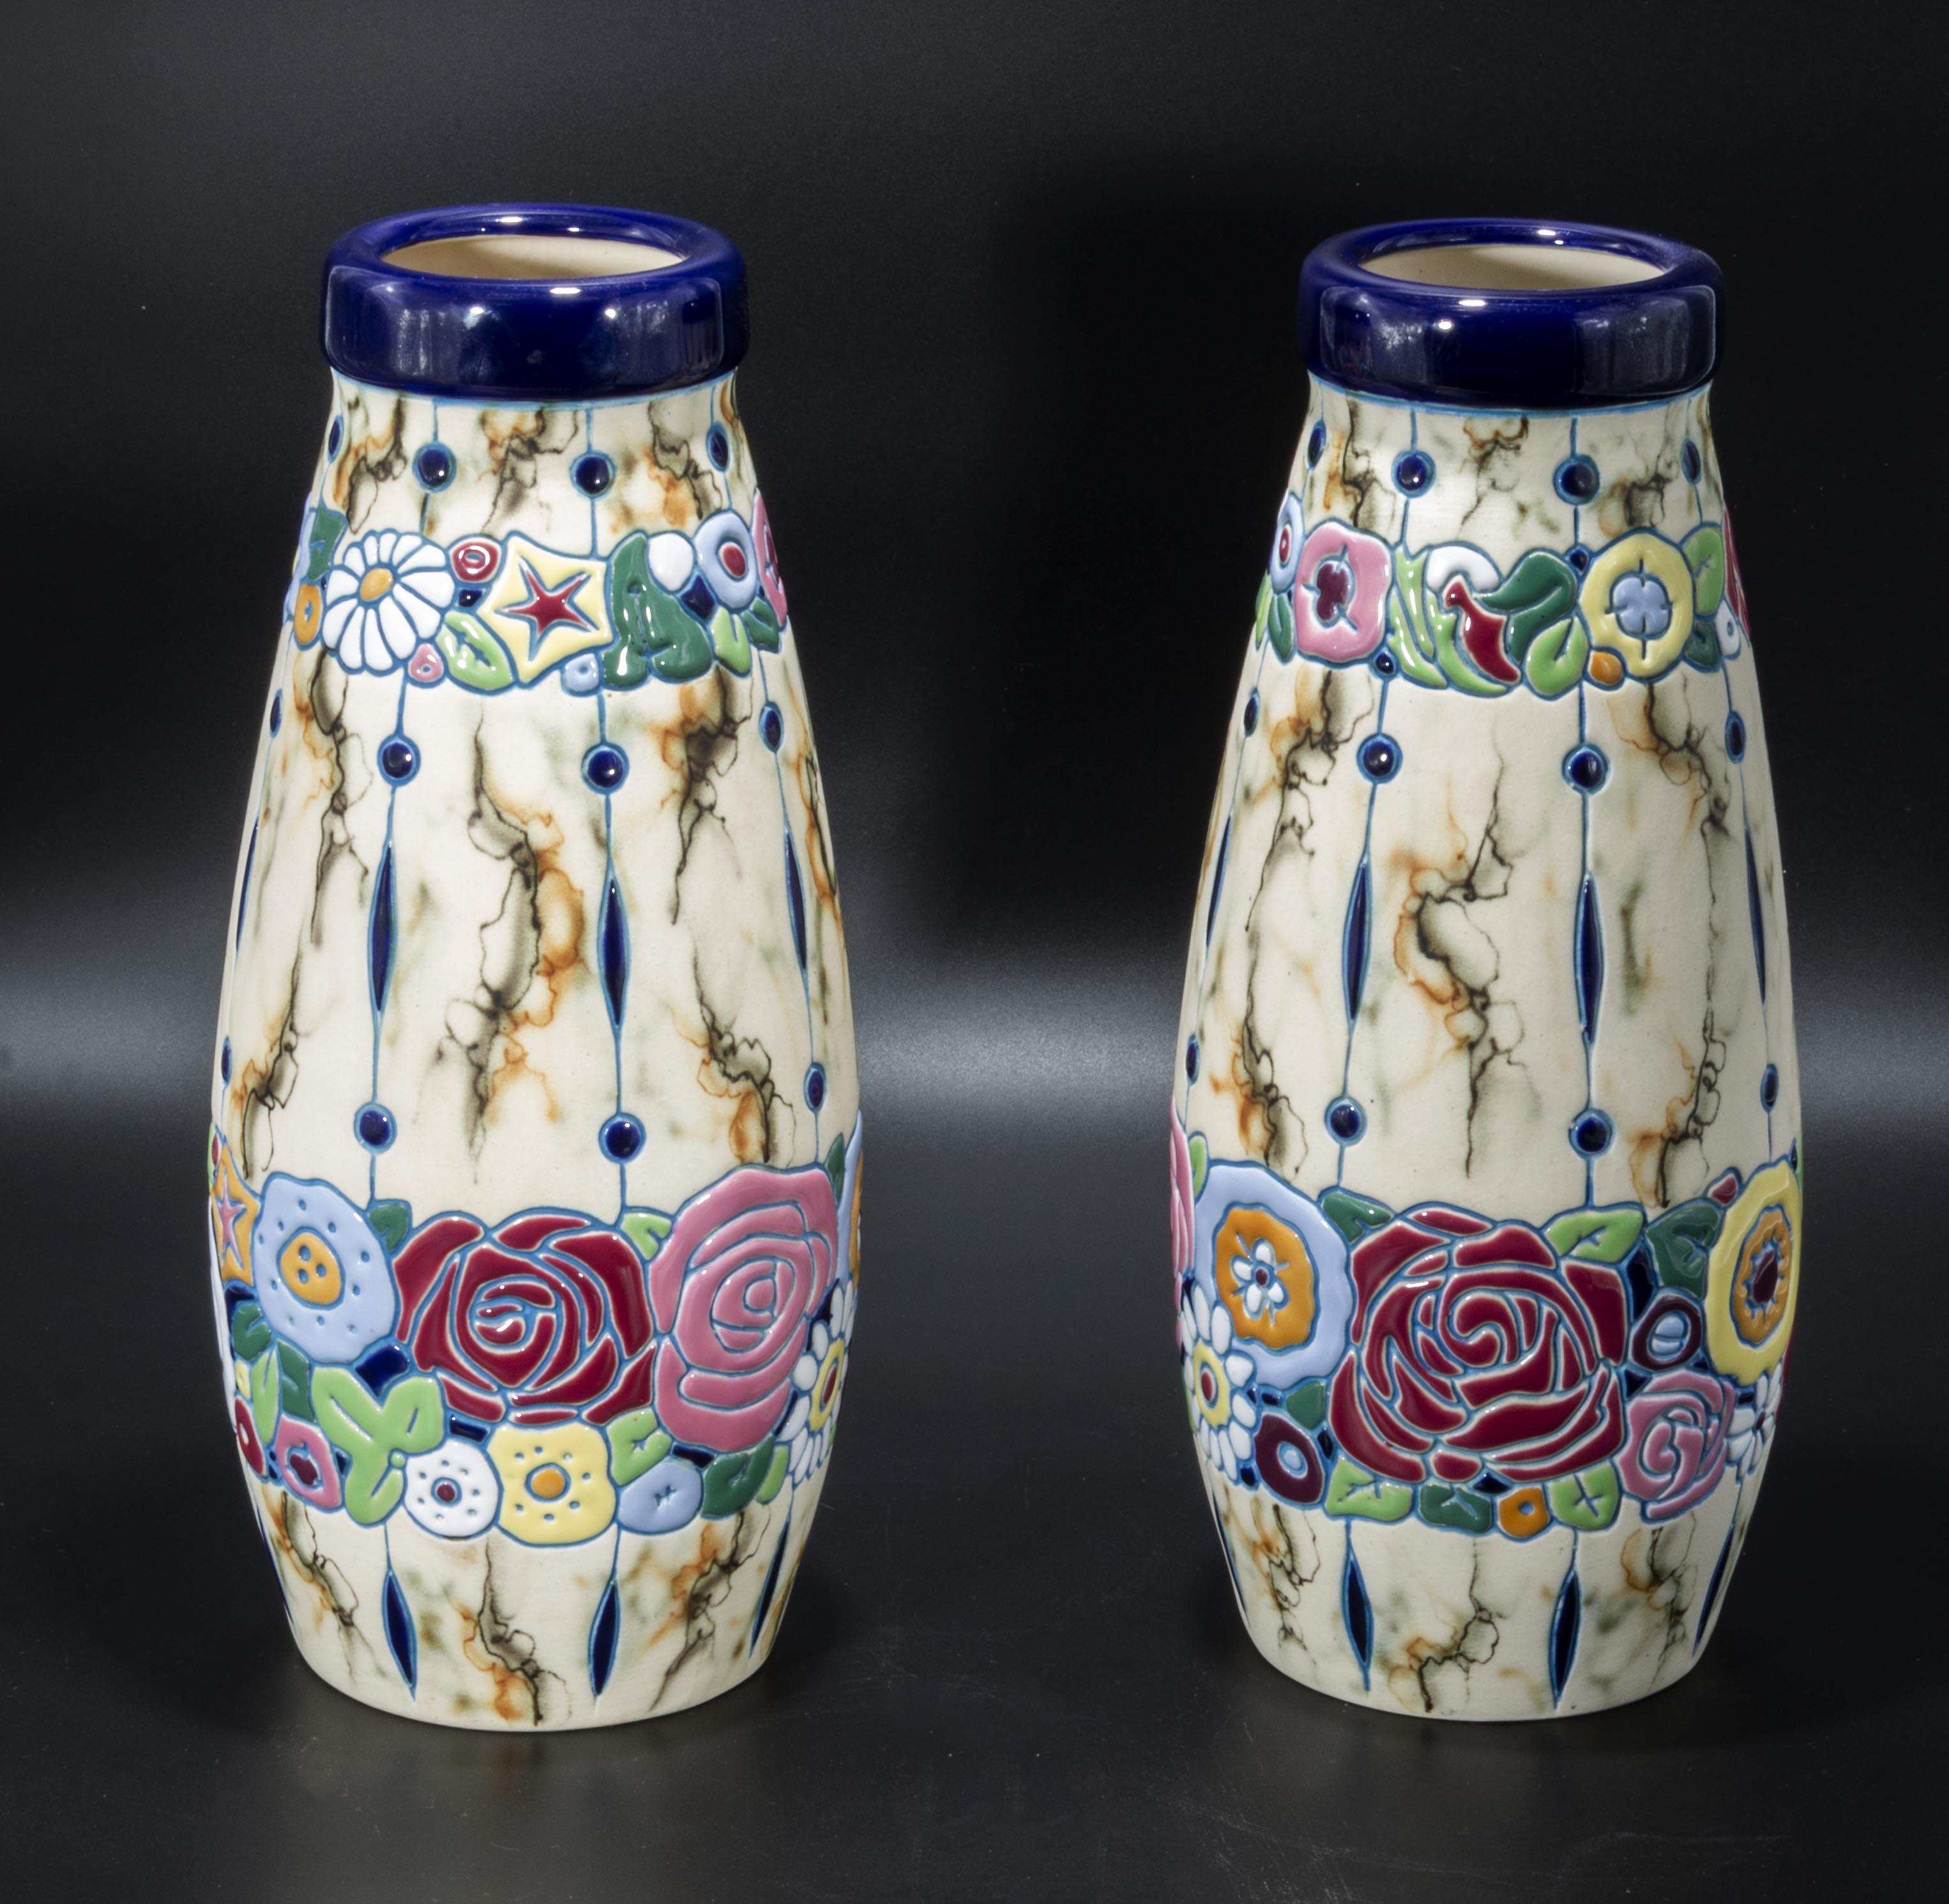 Lot 6 - A pair of Czechoslovakia vases